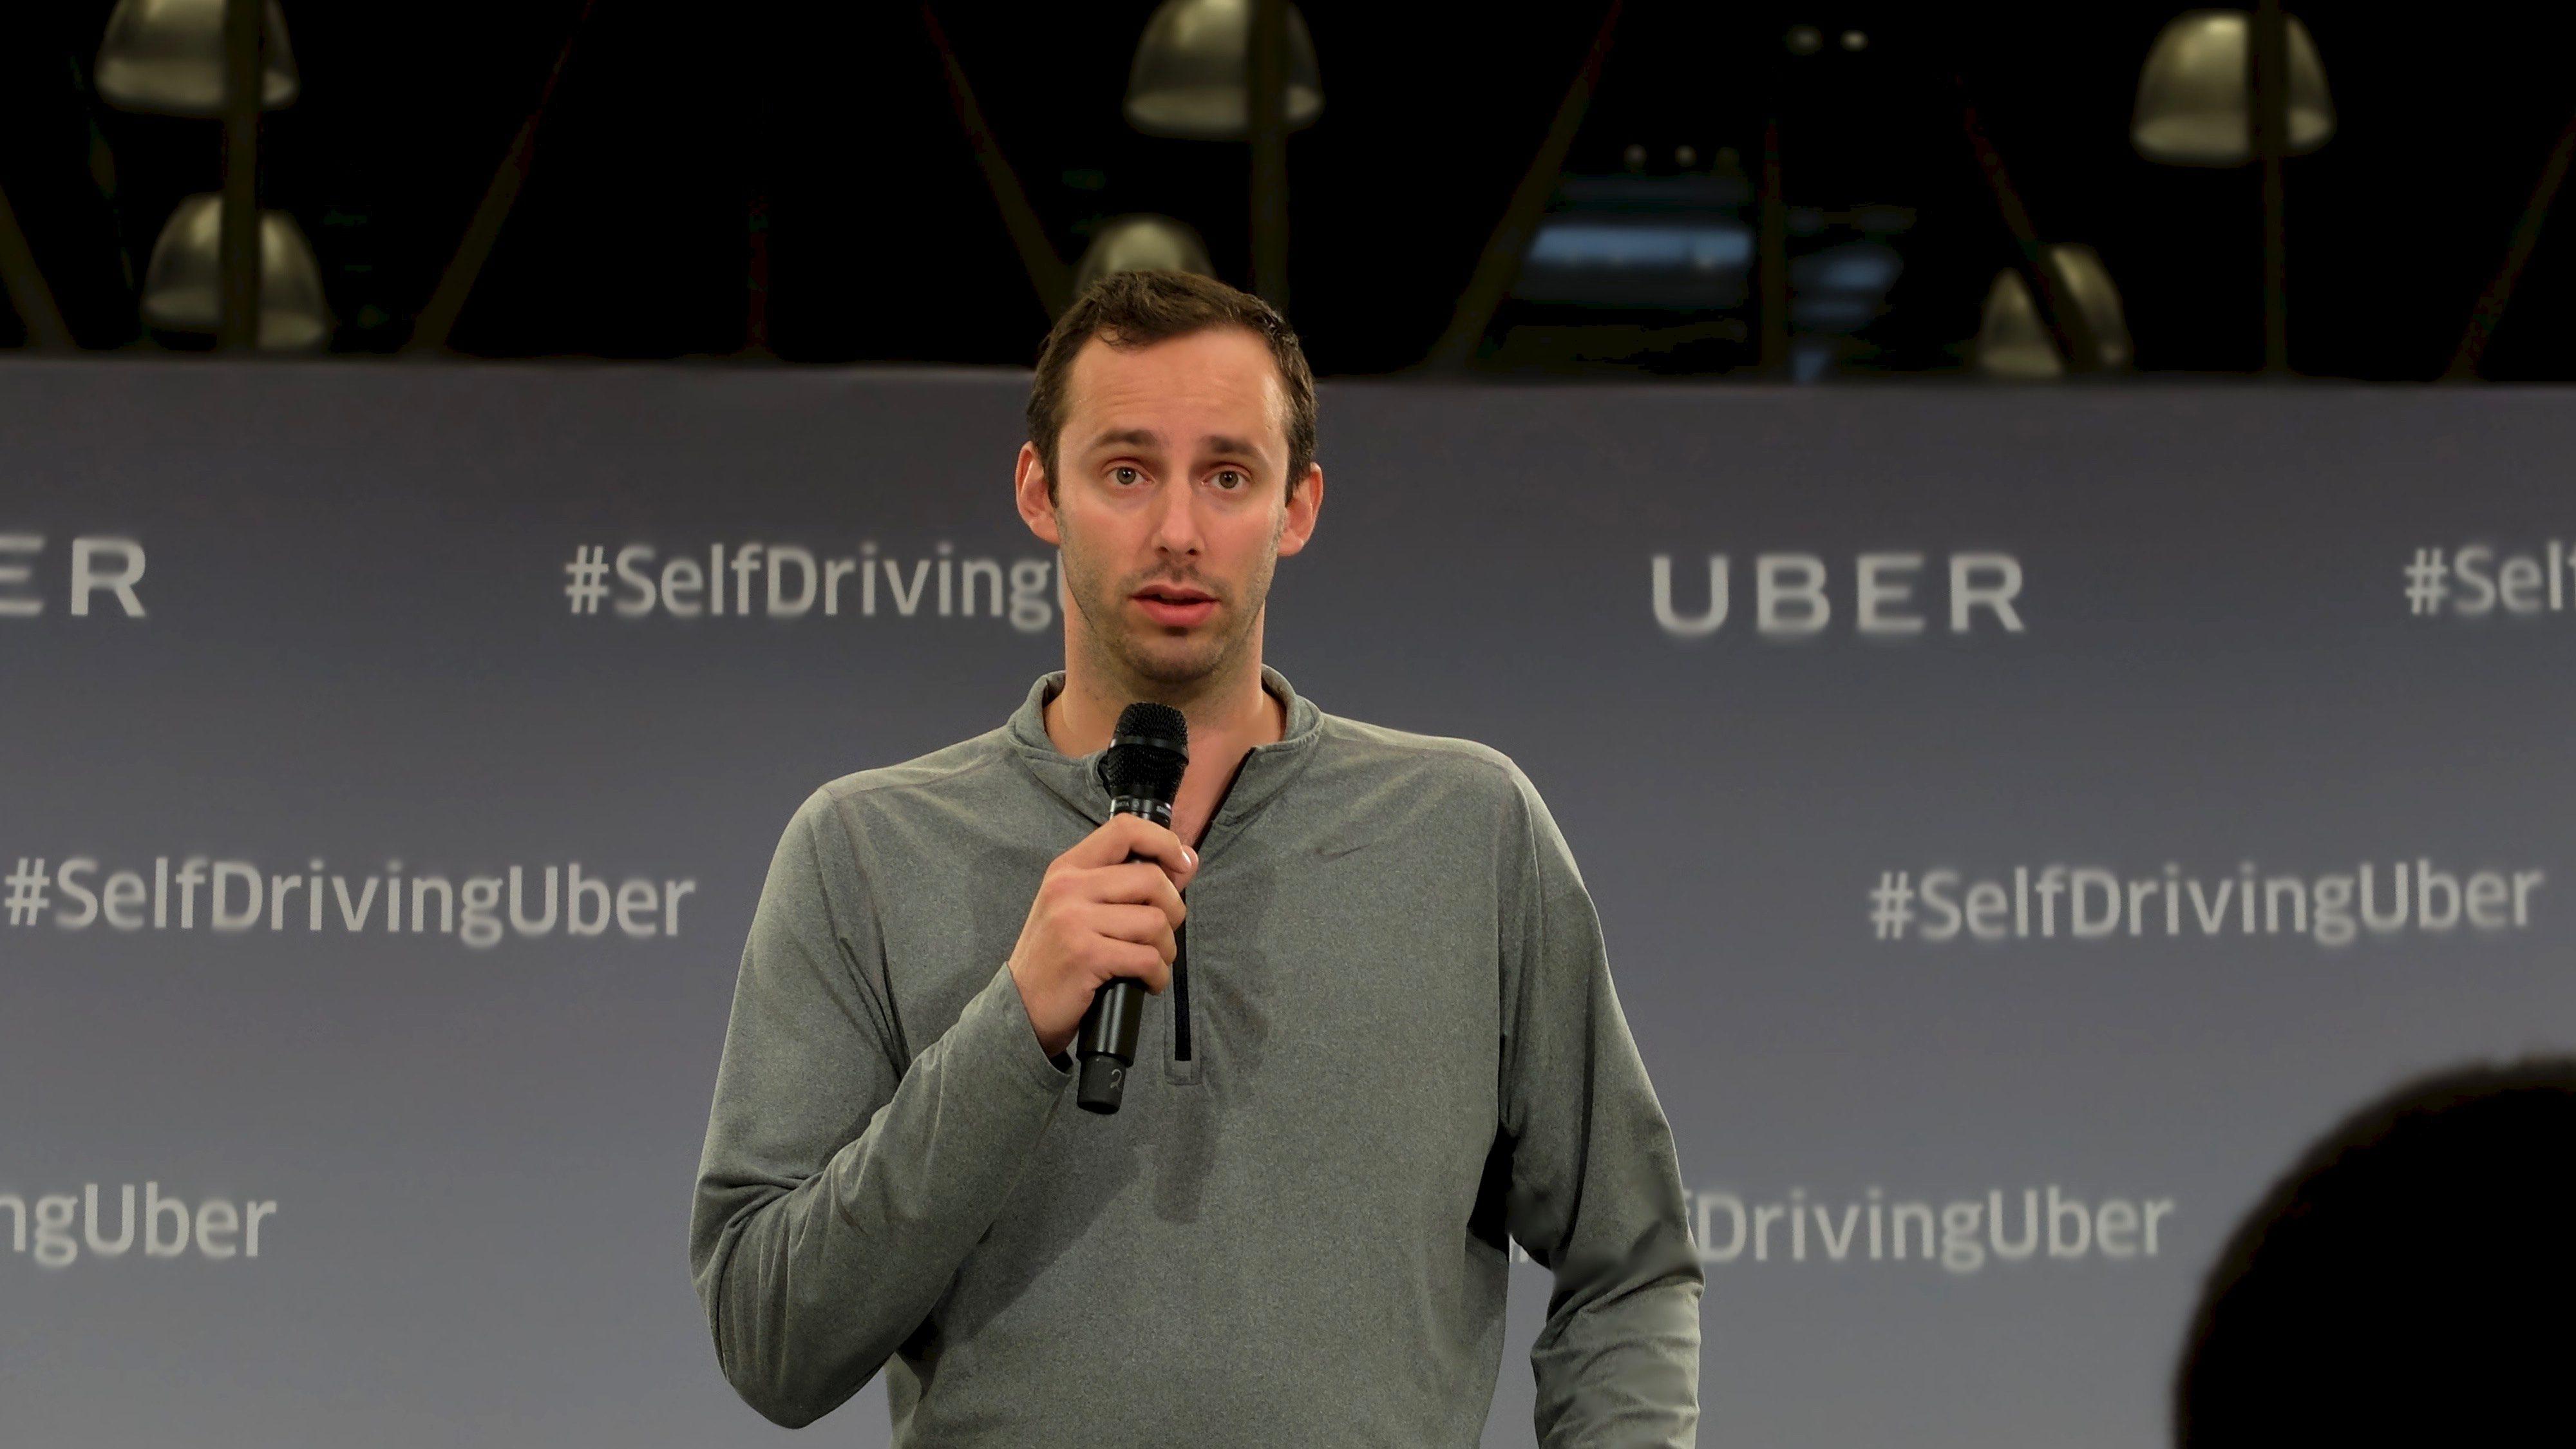 Uber engineer and former Waymo employee Anthony Levandowski